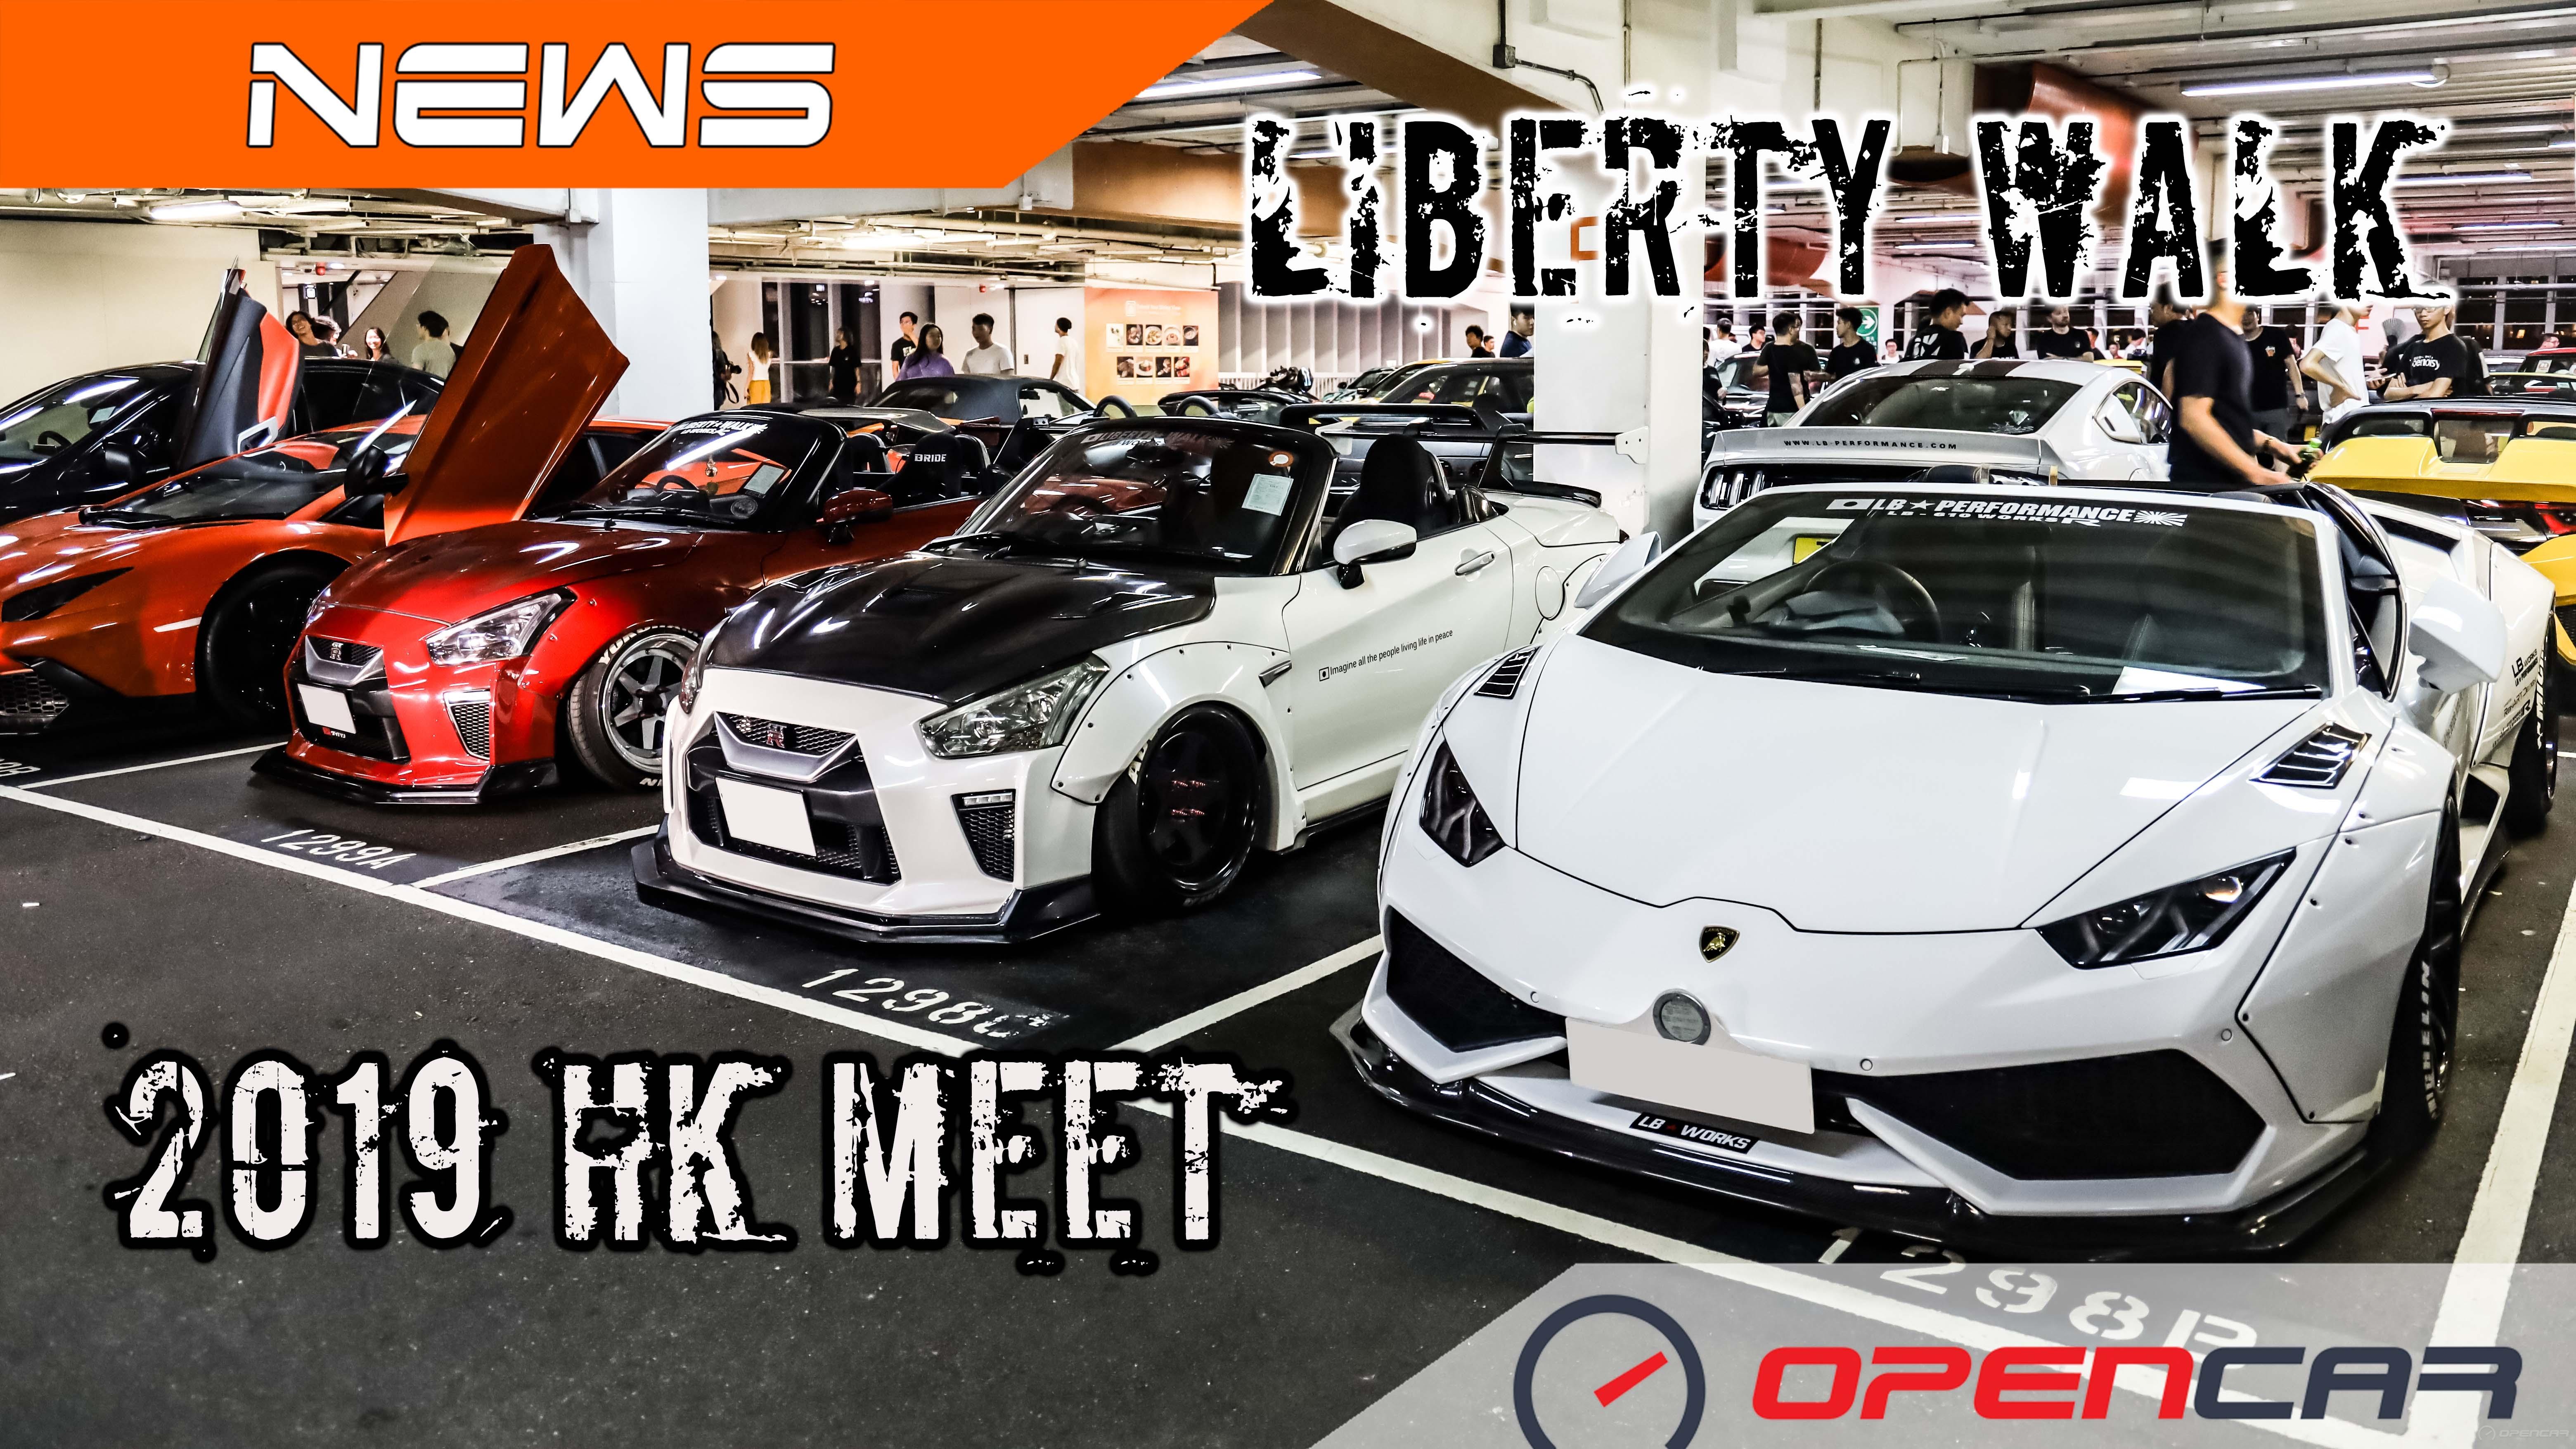 Liberty Walk 2019 HK Meet